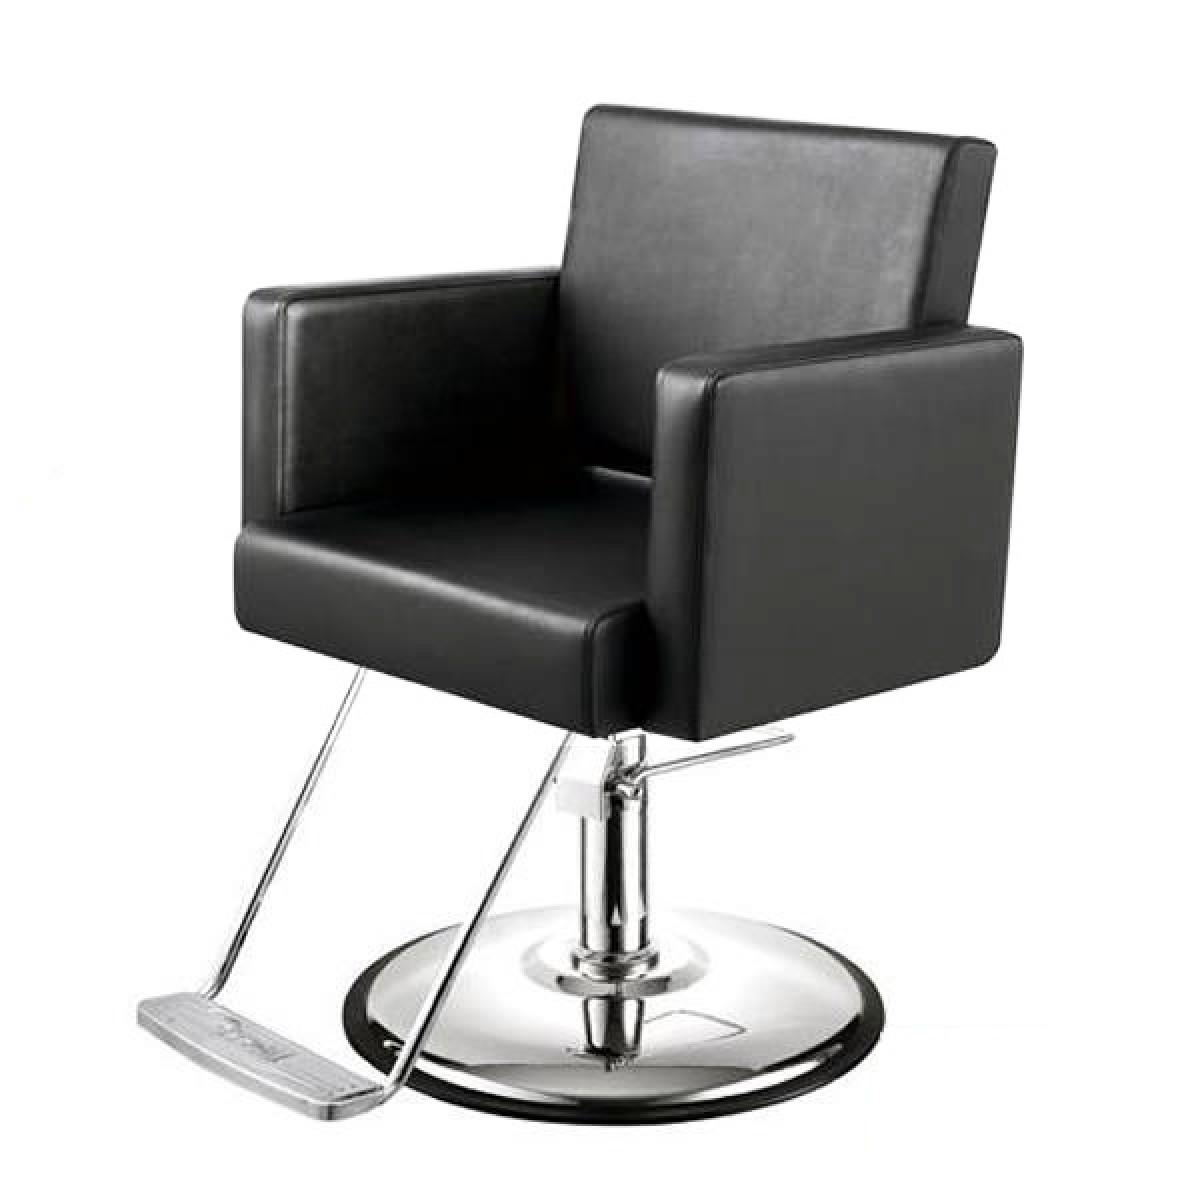 """CANON"" Salon Styling Chair"